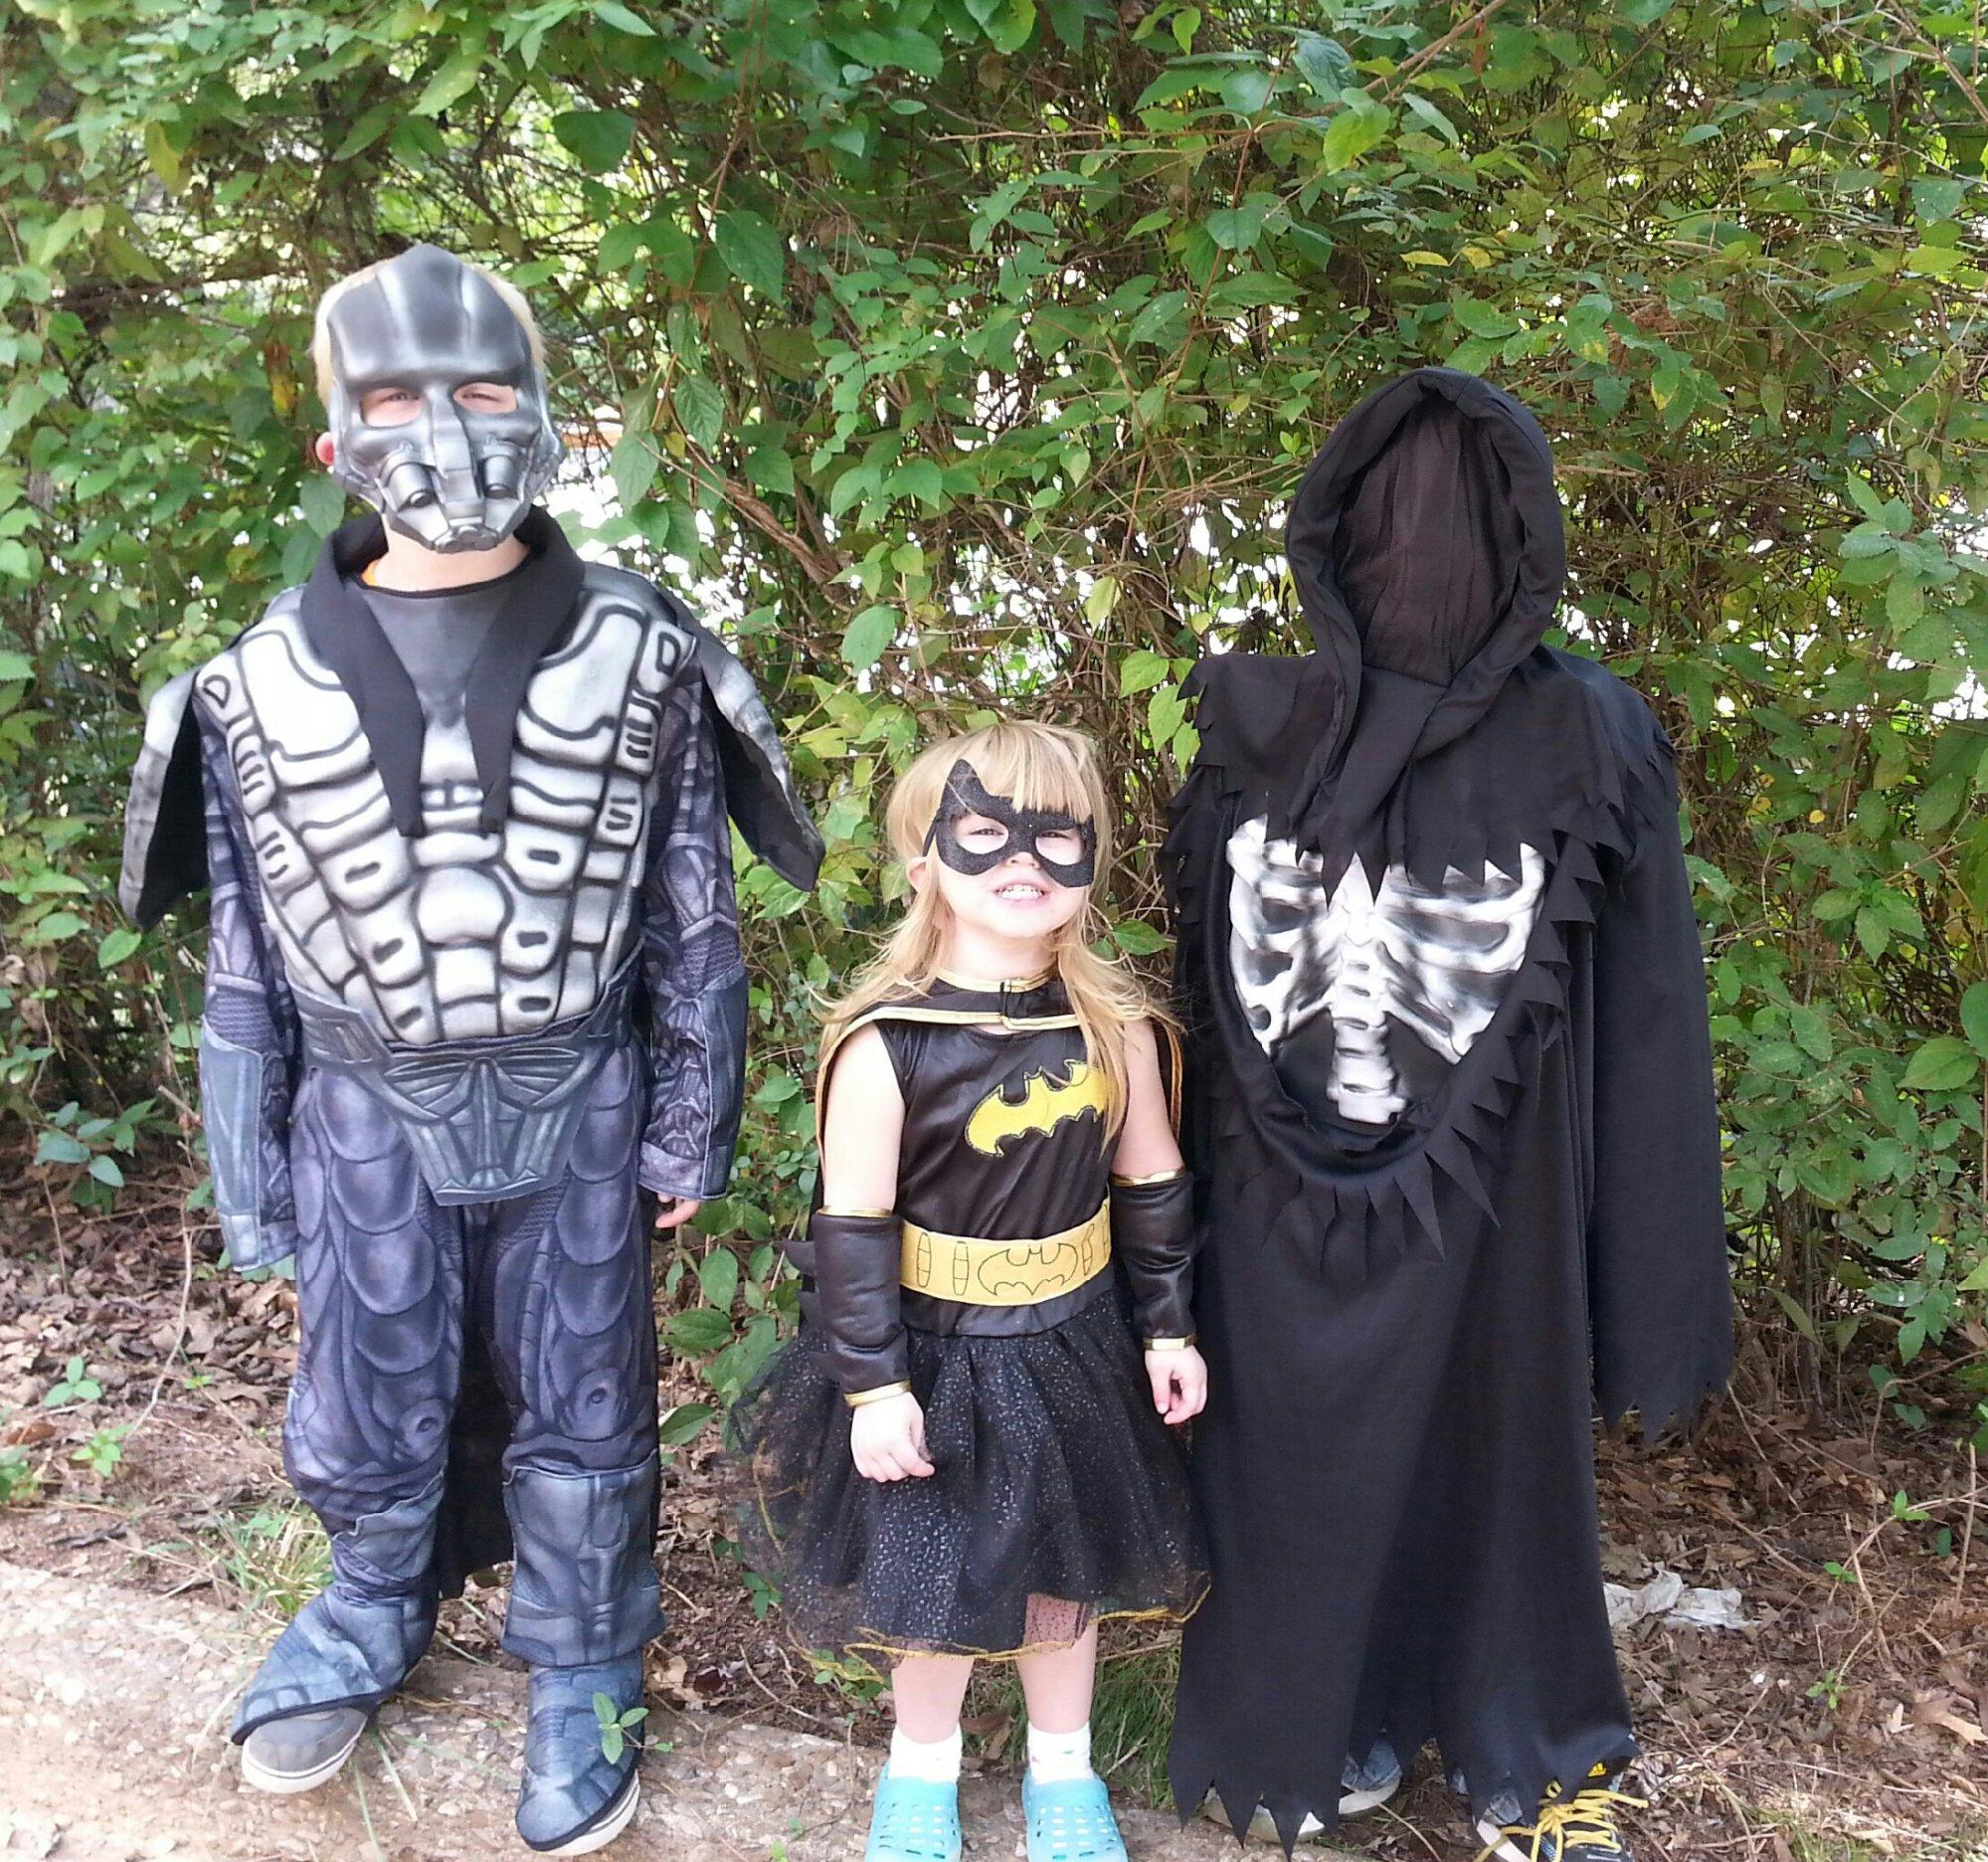 iPix: Halloween Costumes | Fort Smith/Fayetteville News ...